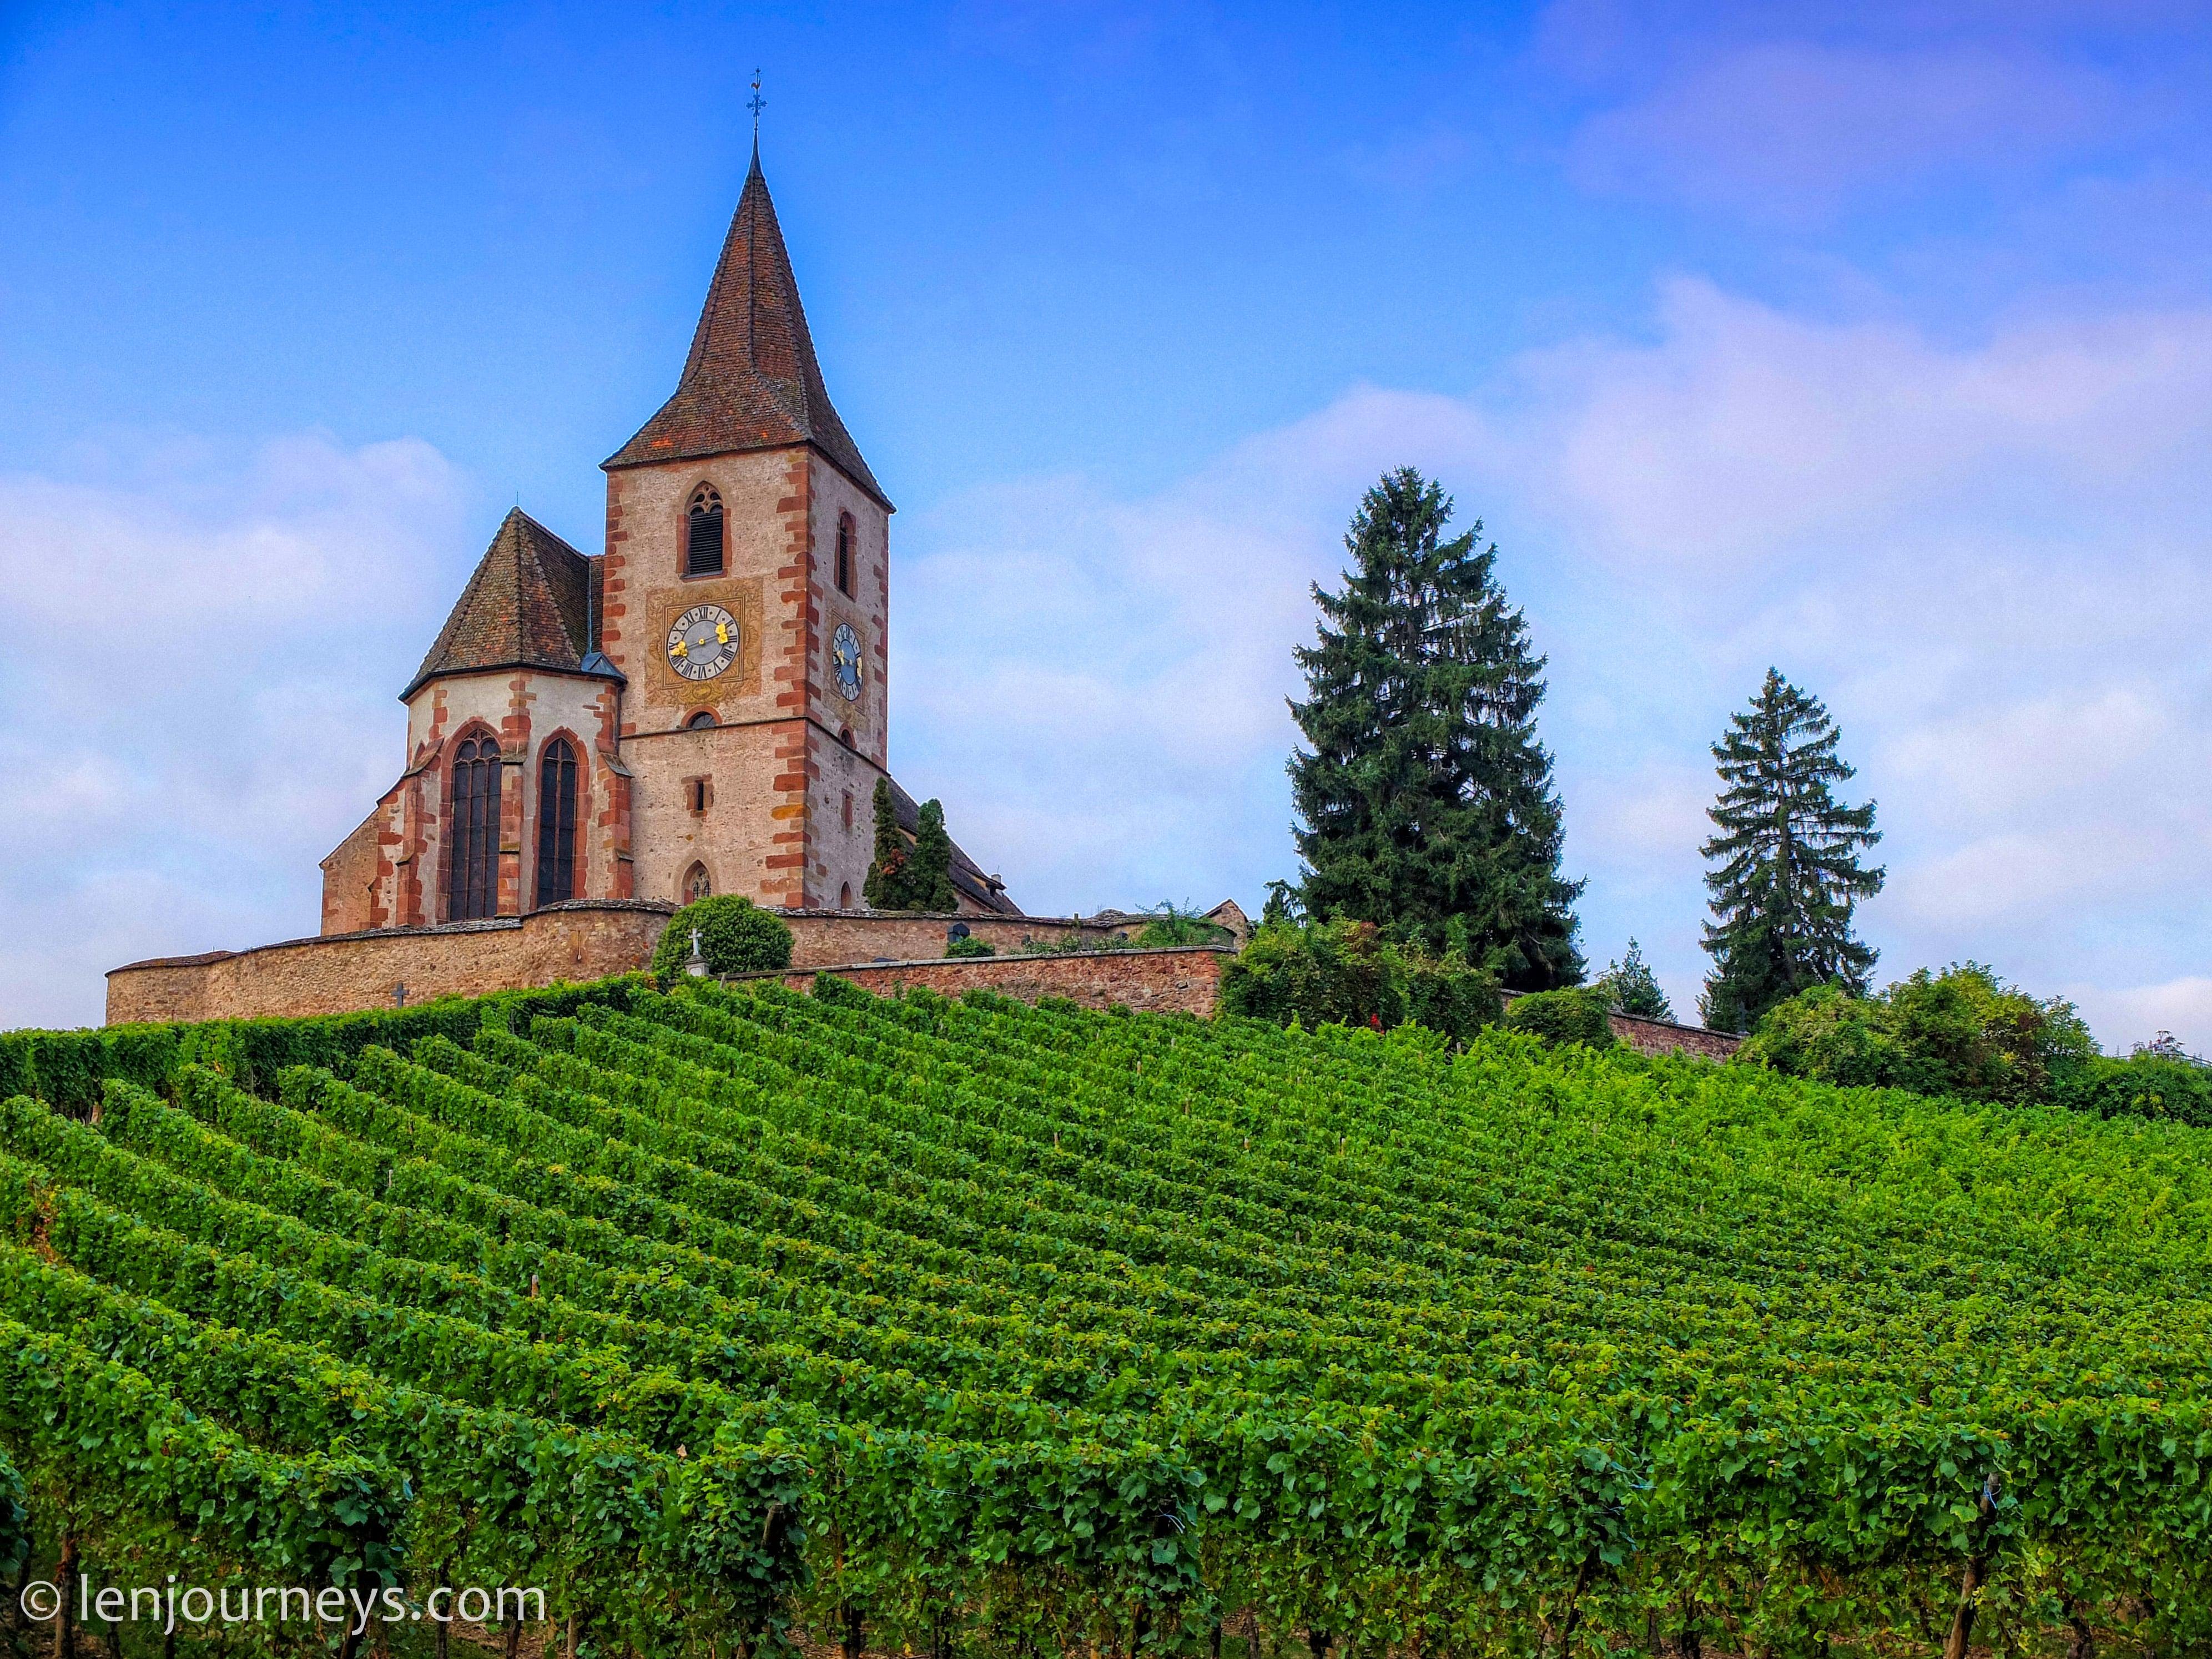 Church in Hunawihr, Alsace